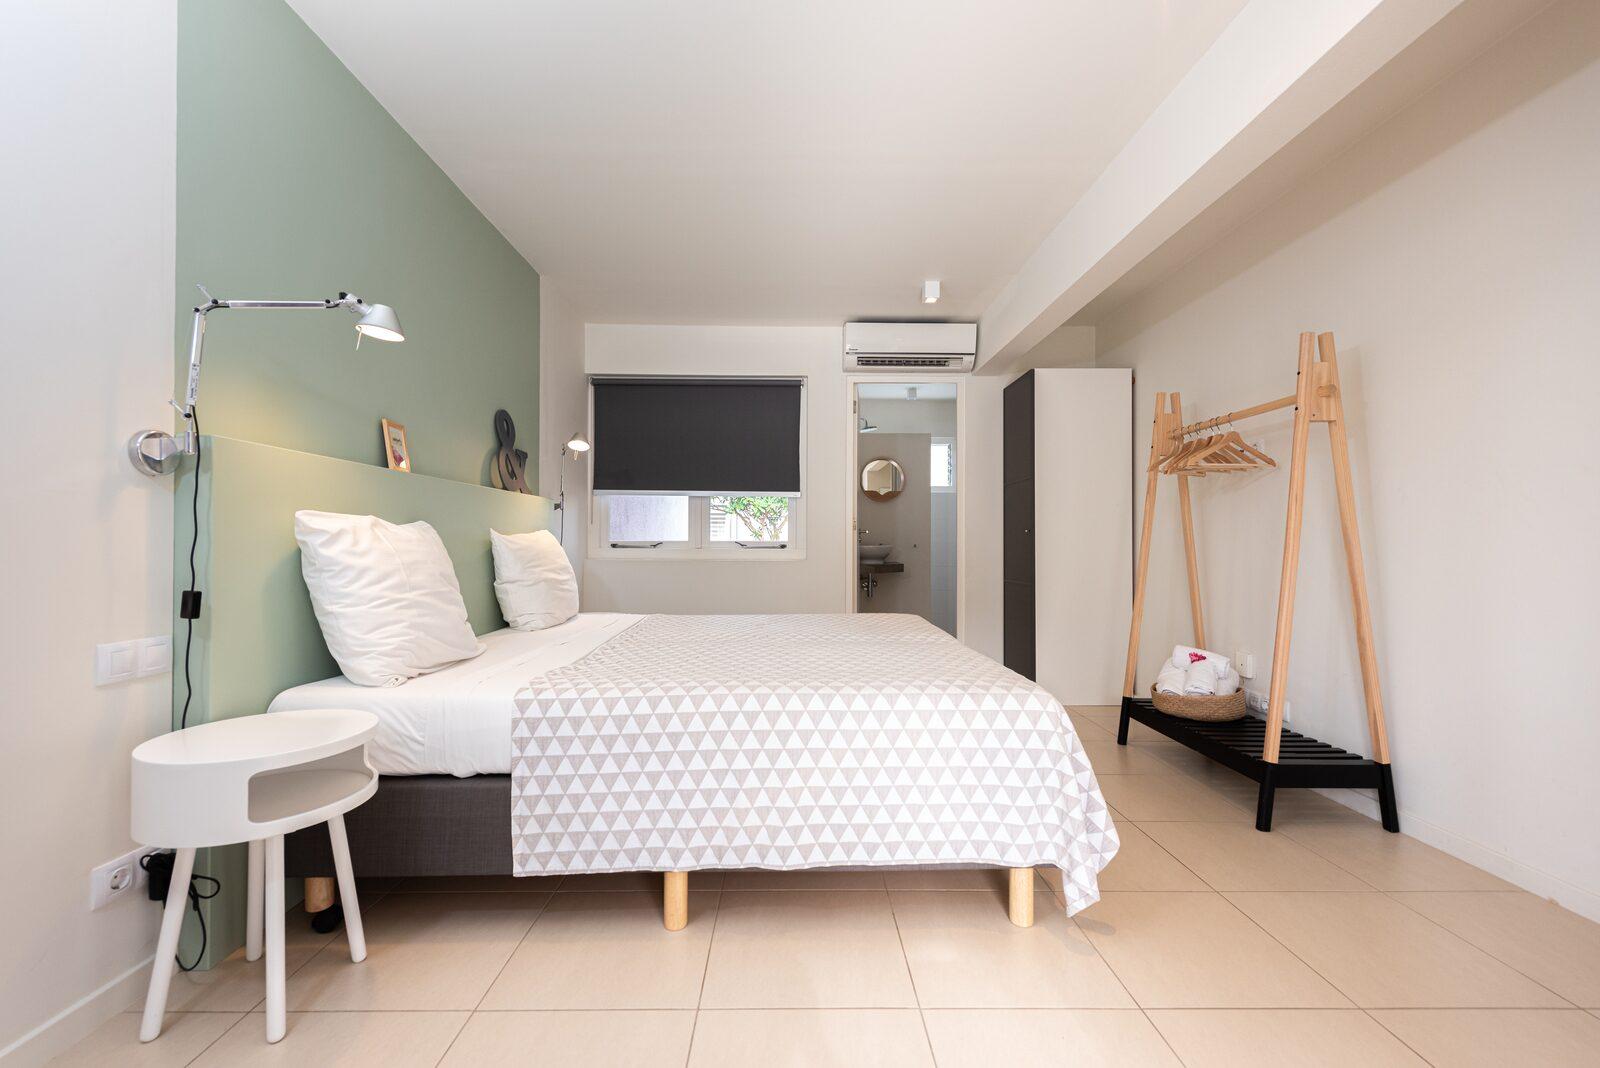 4-Person Holiday Home Lanais Deluxe